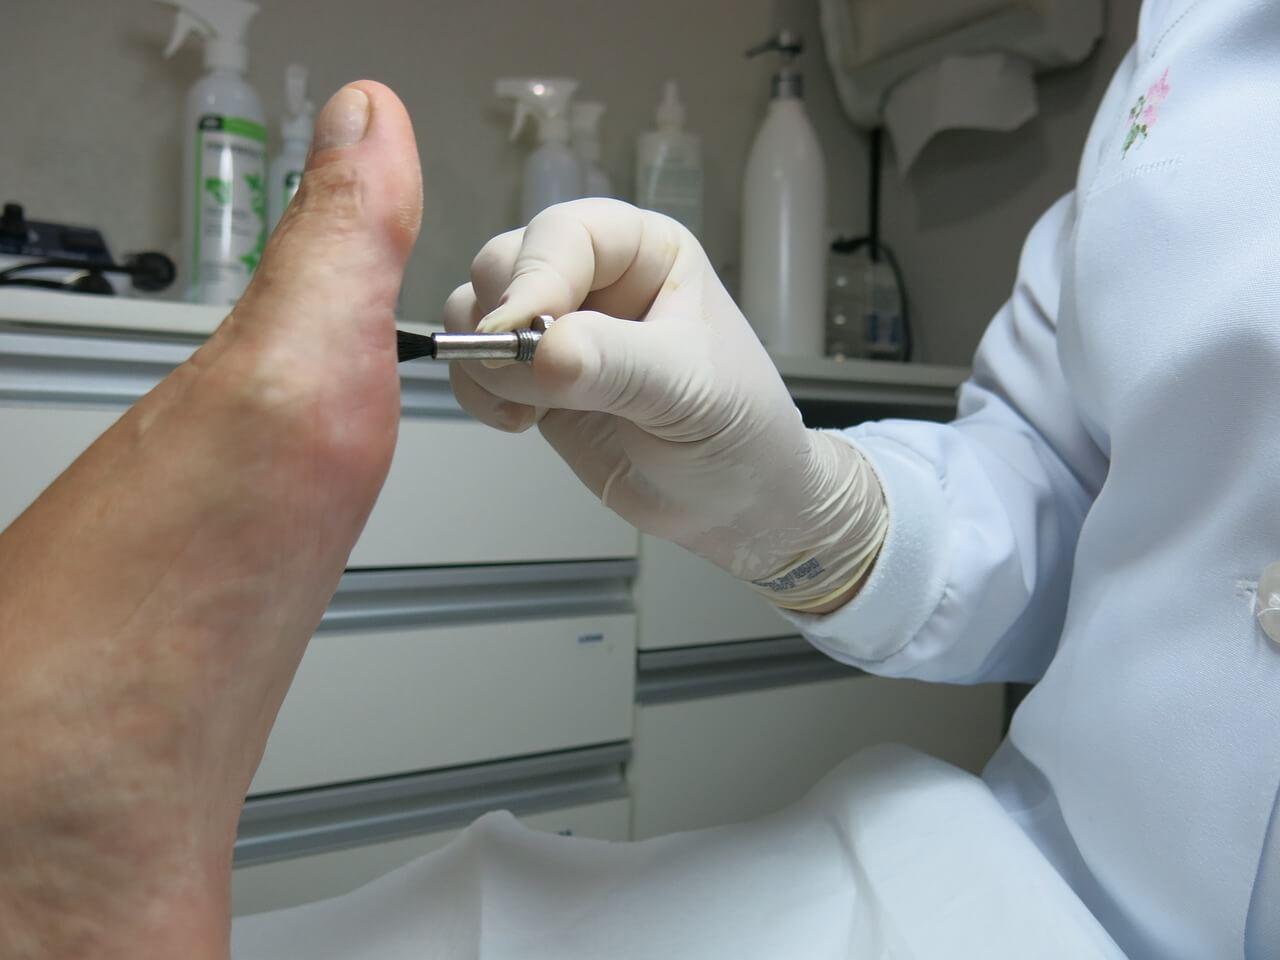 Fußpilz behandeln - so geht´s